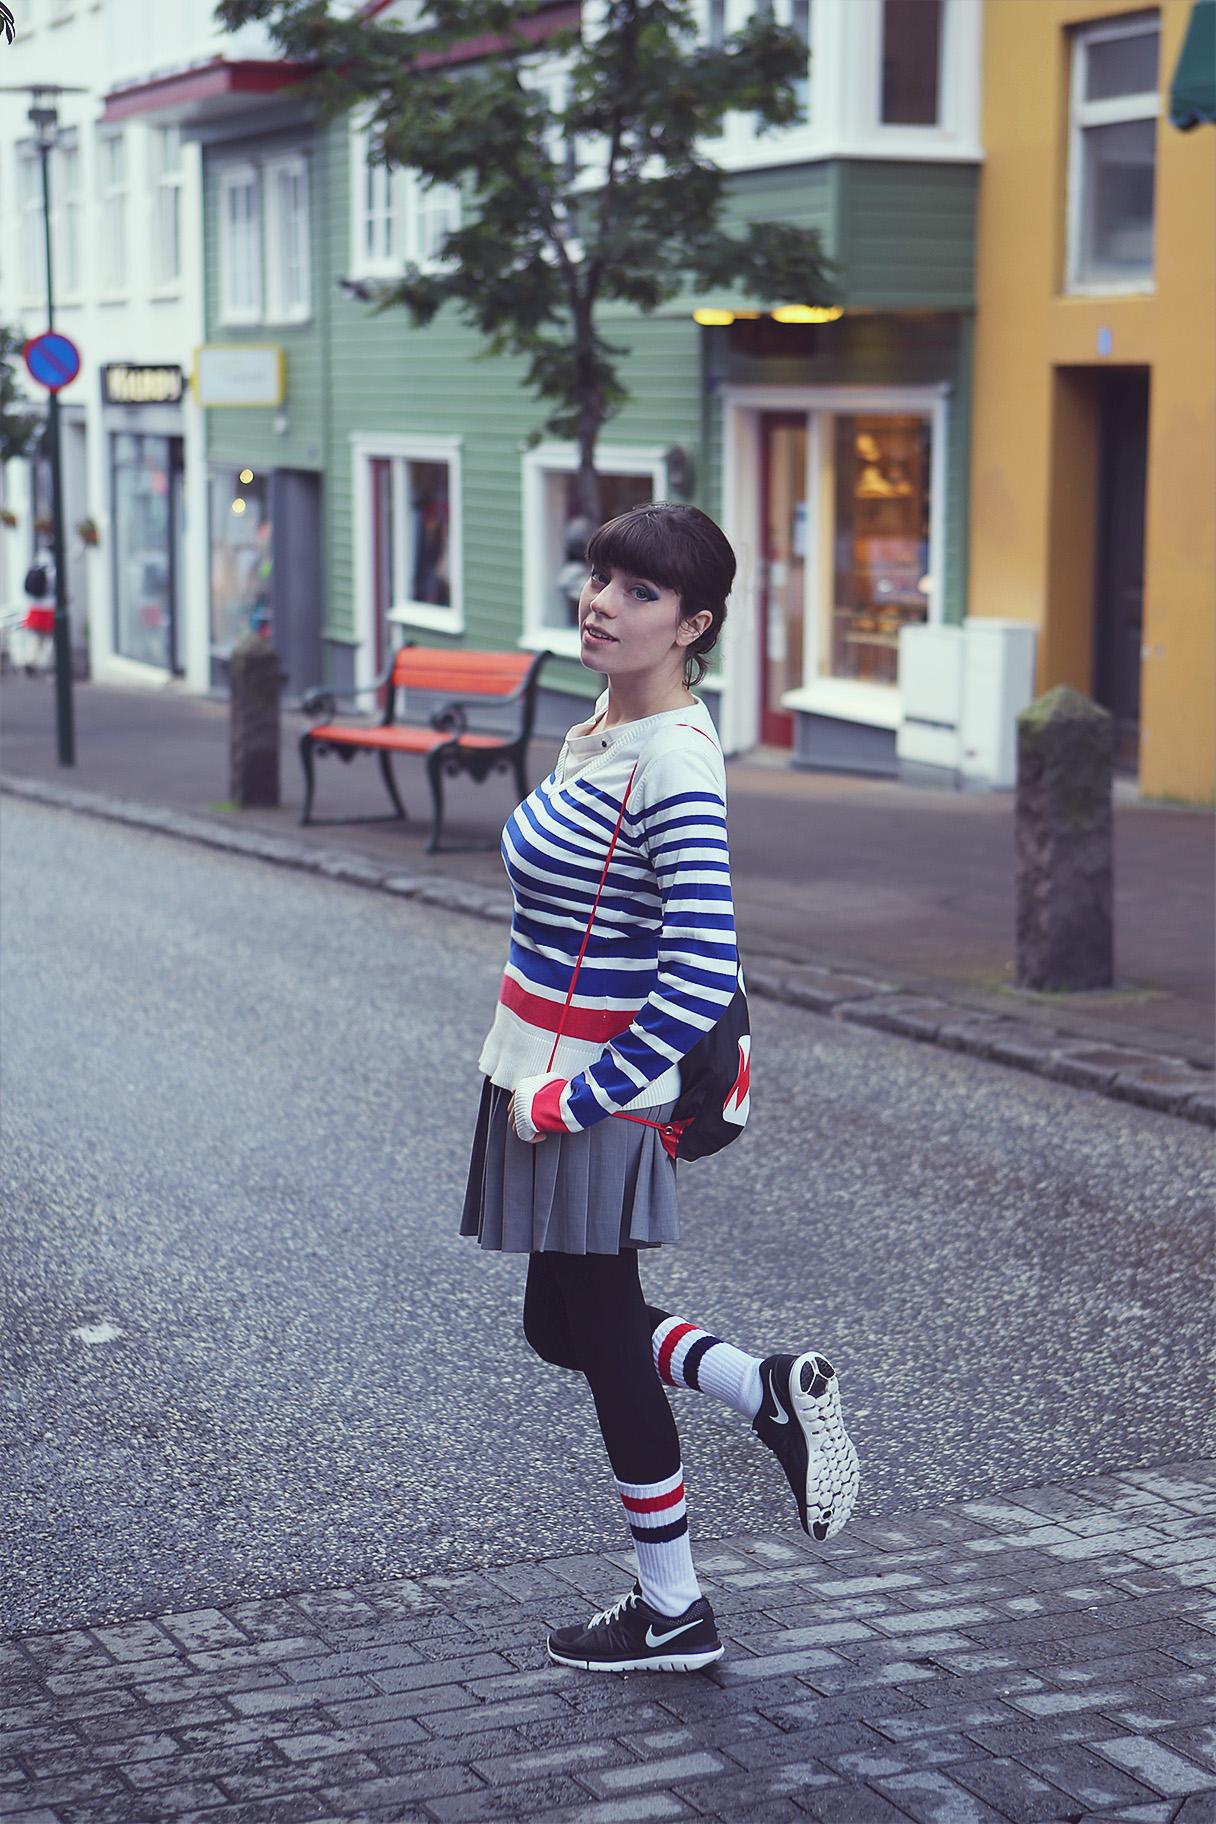 Walking in Reykjavik - 23